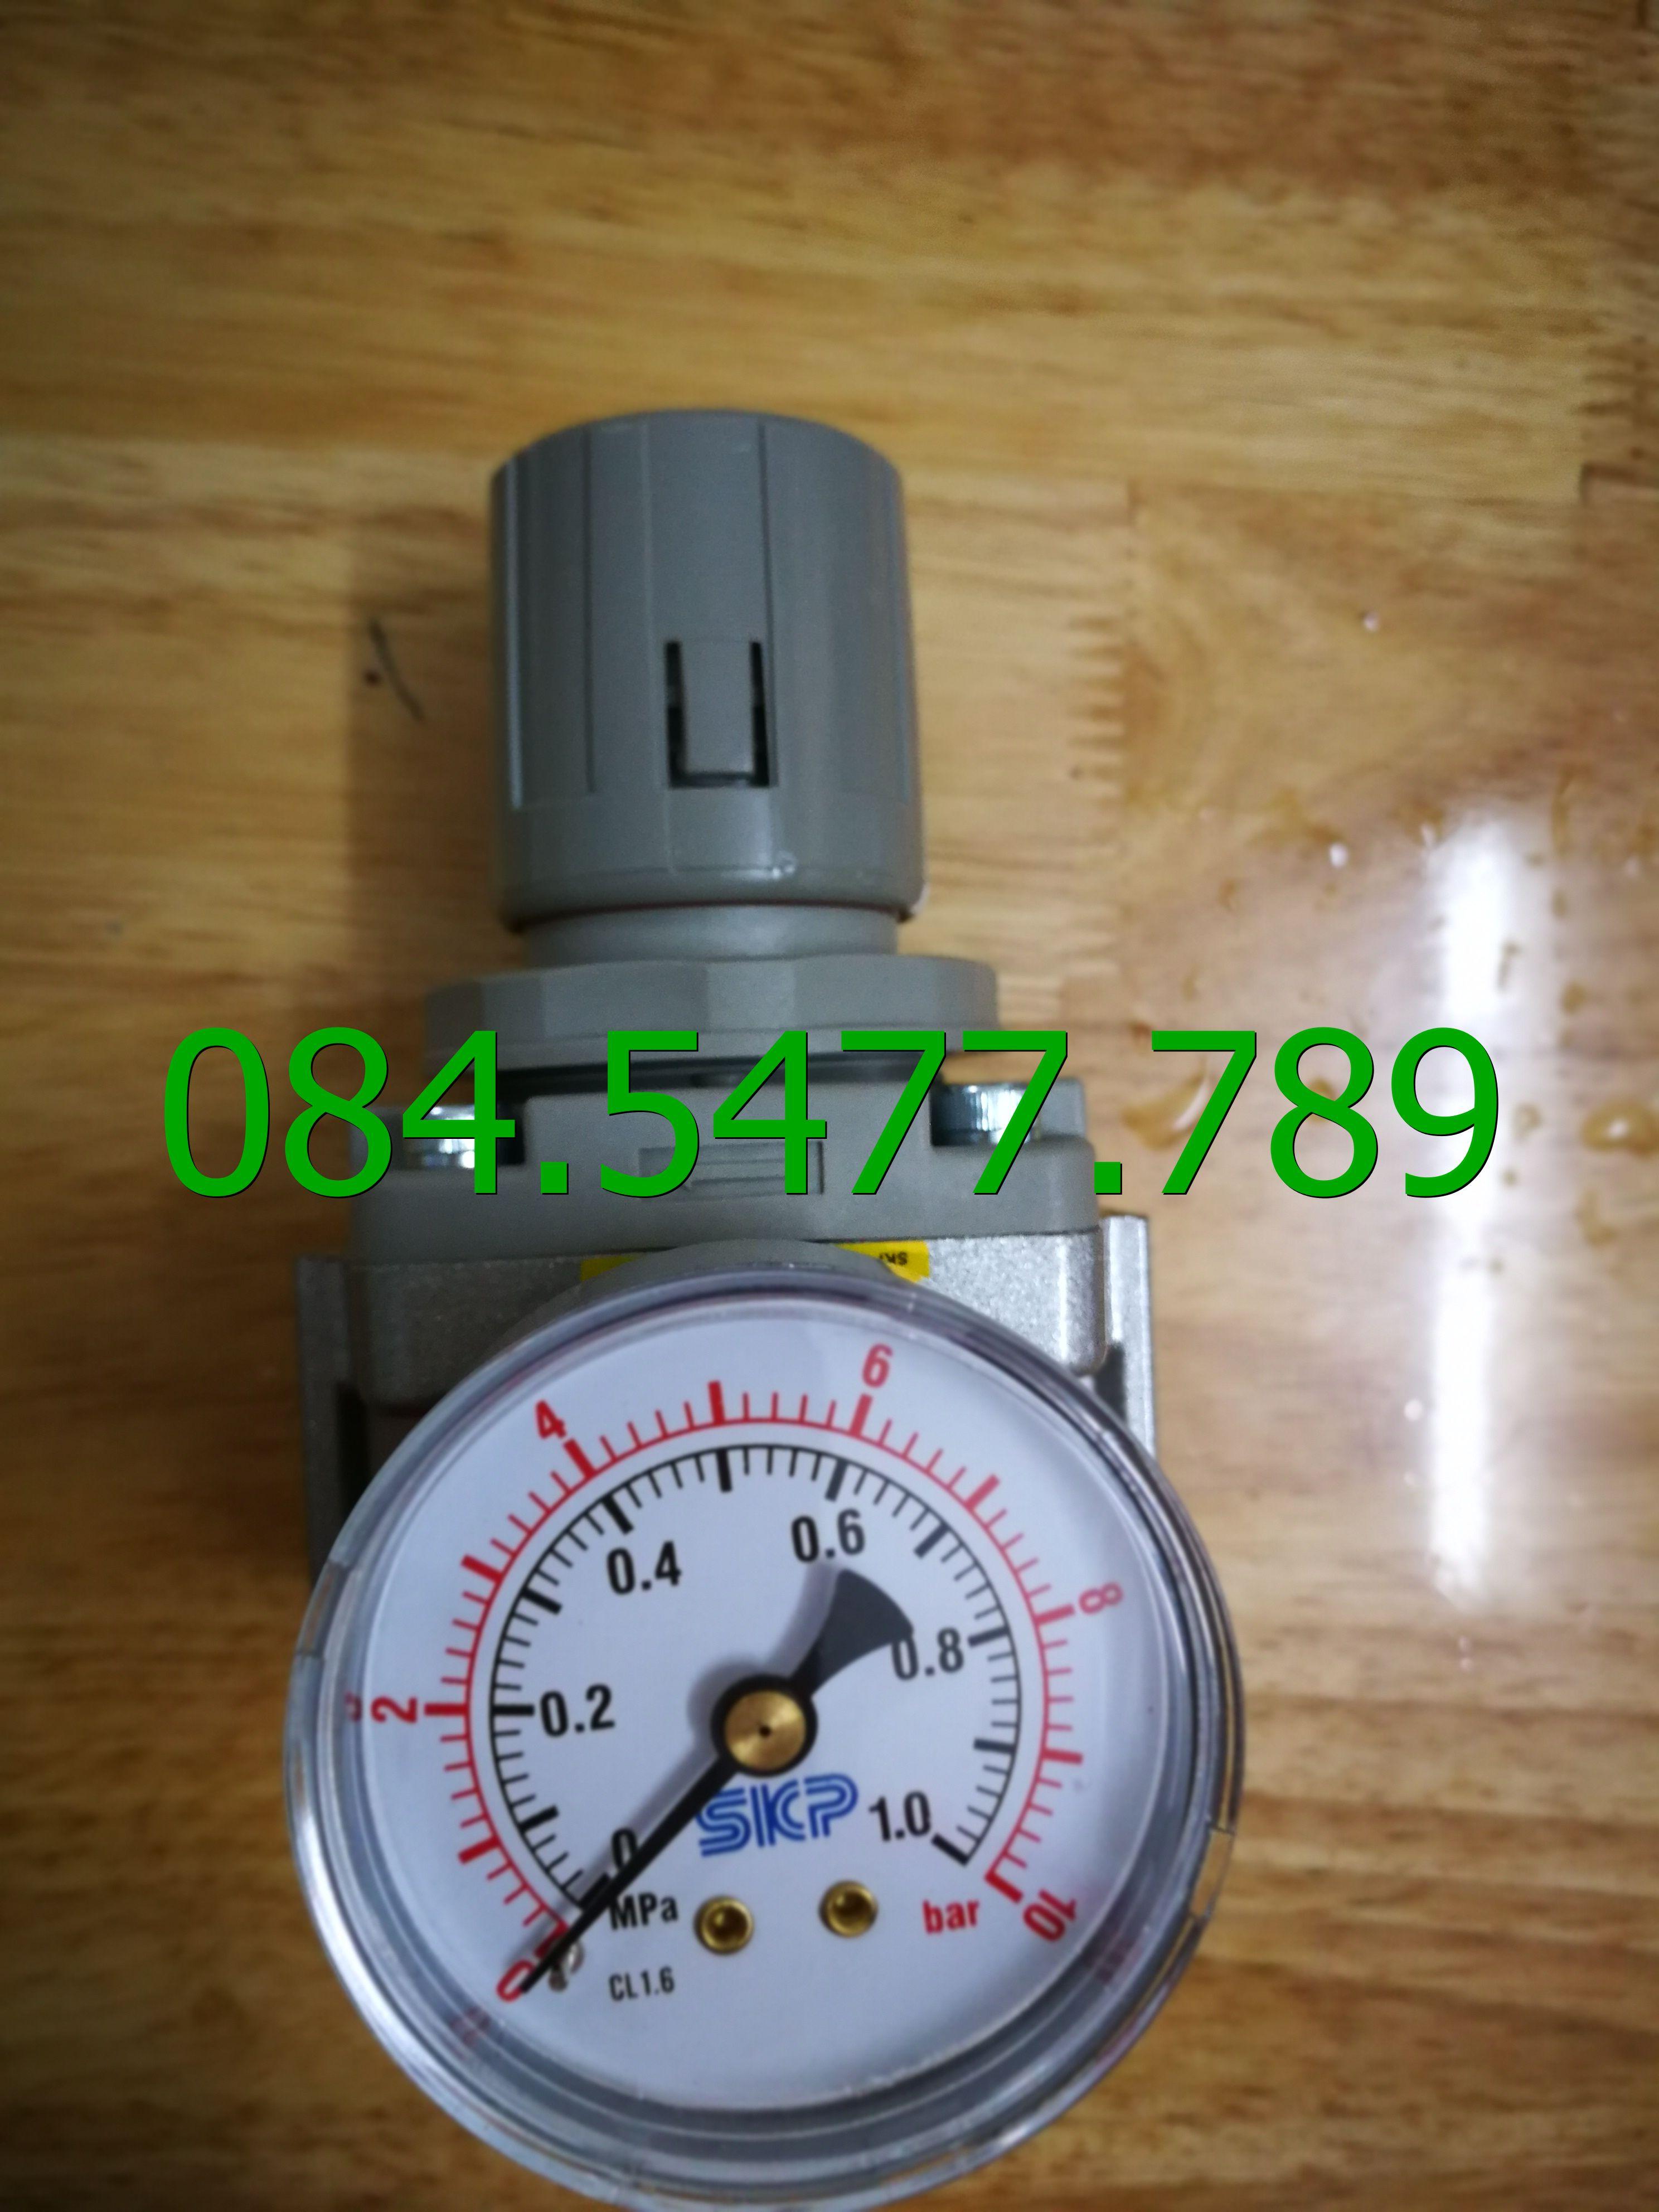 Bộ điều chỉnh áp suất khí nén SAR6000M-06BG